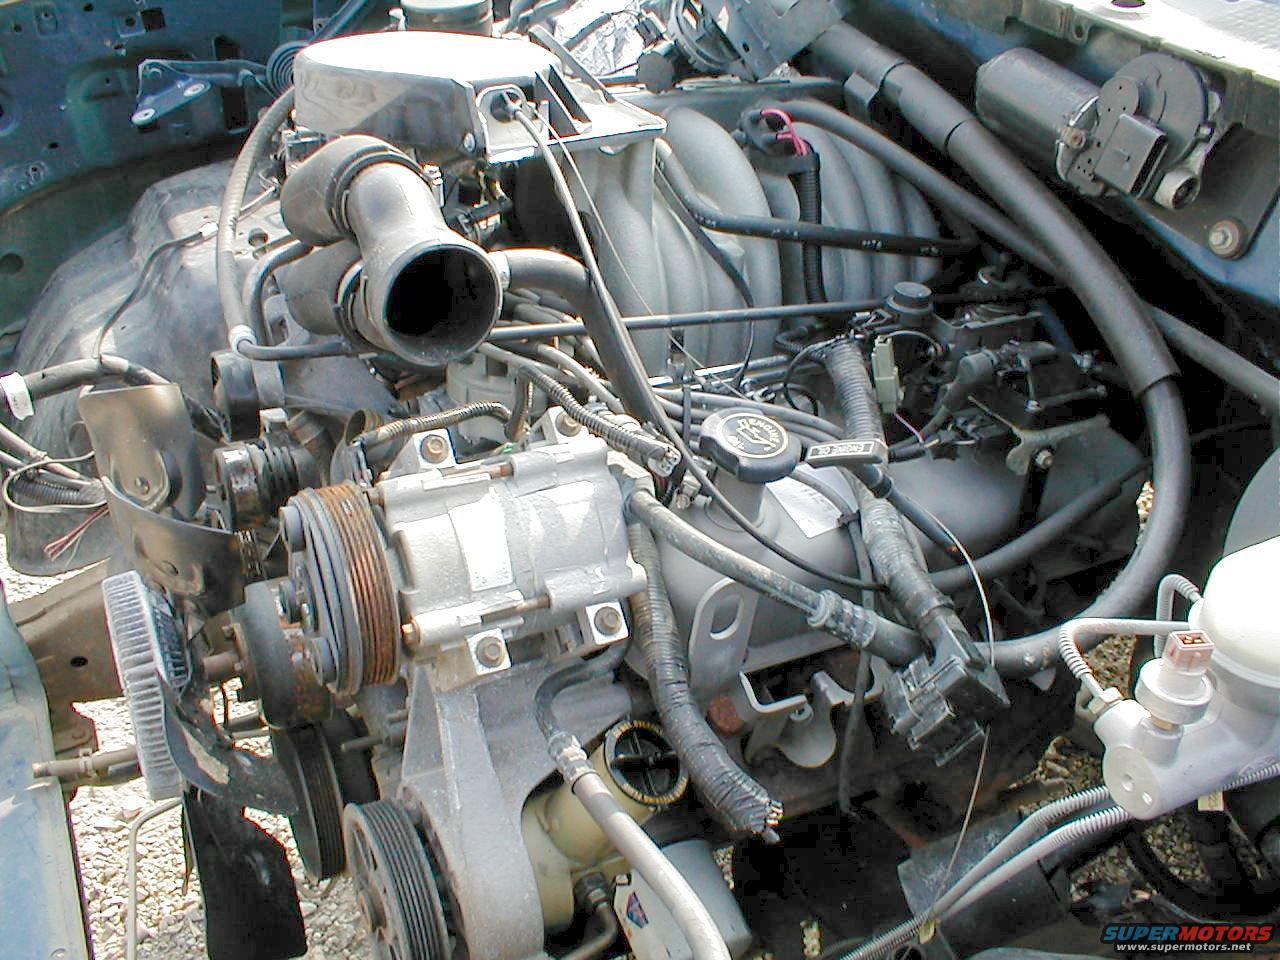 Efi 351 Windsor Engine Diagram 1990  W Fuel Injected Engine Diagram on 1993 351w diagram, 302 firing order diagram, 1990 f350 5.8l vacuum diagram,